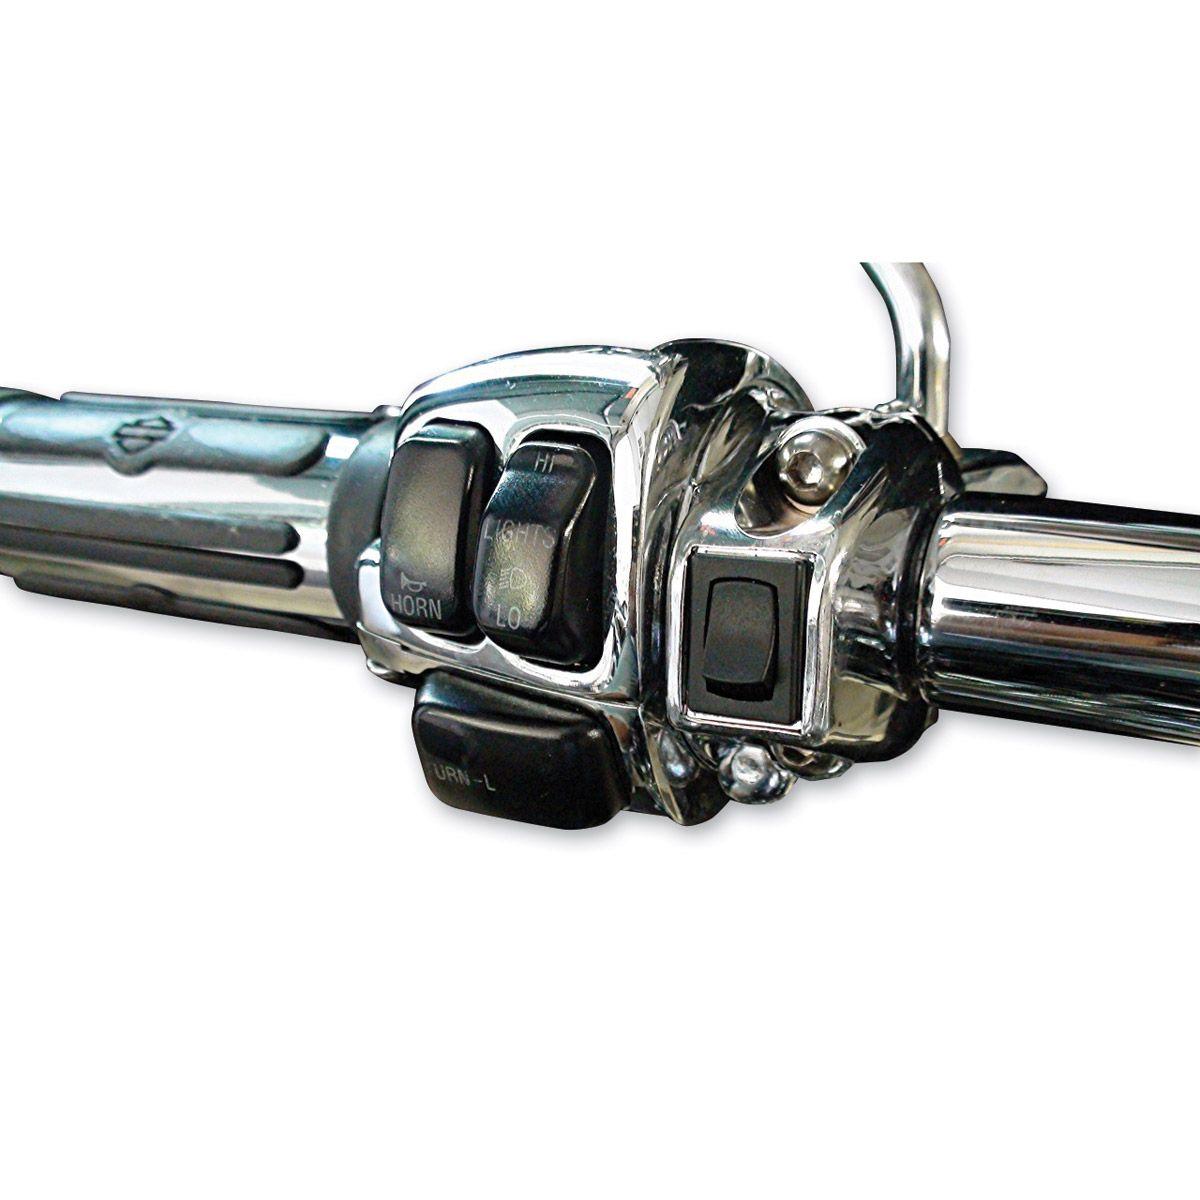 Grip Switch Garage Door Opener Kit Chrome Gp1c Classic Harley Davidson Harley Harley Davidson Motorcycles